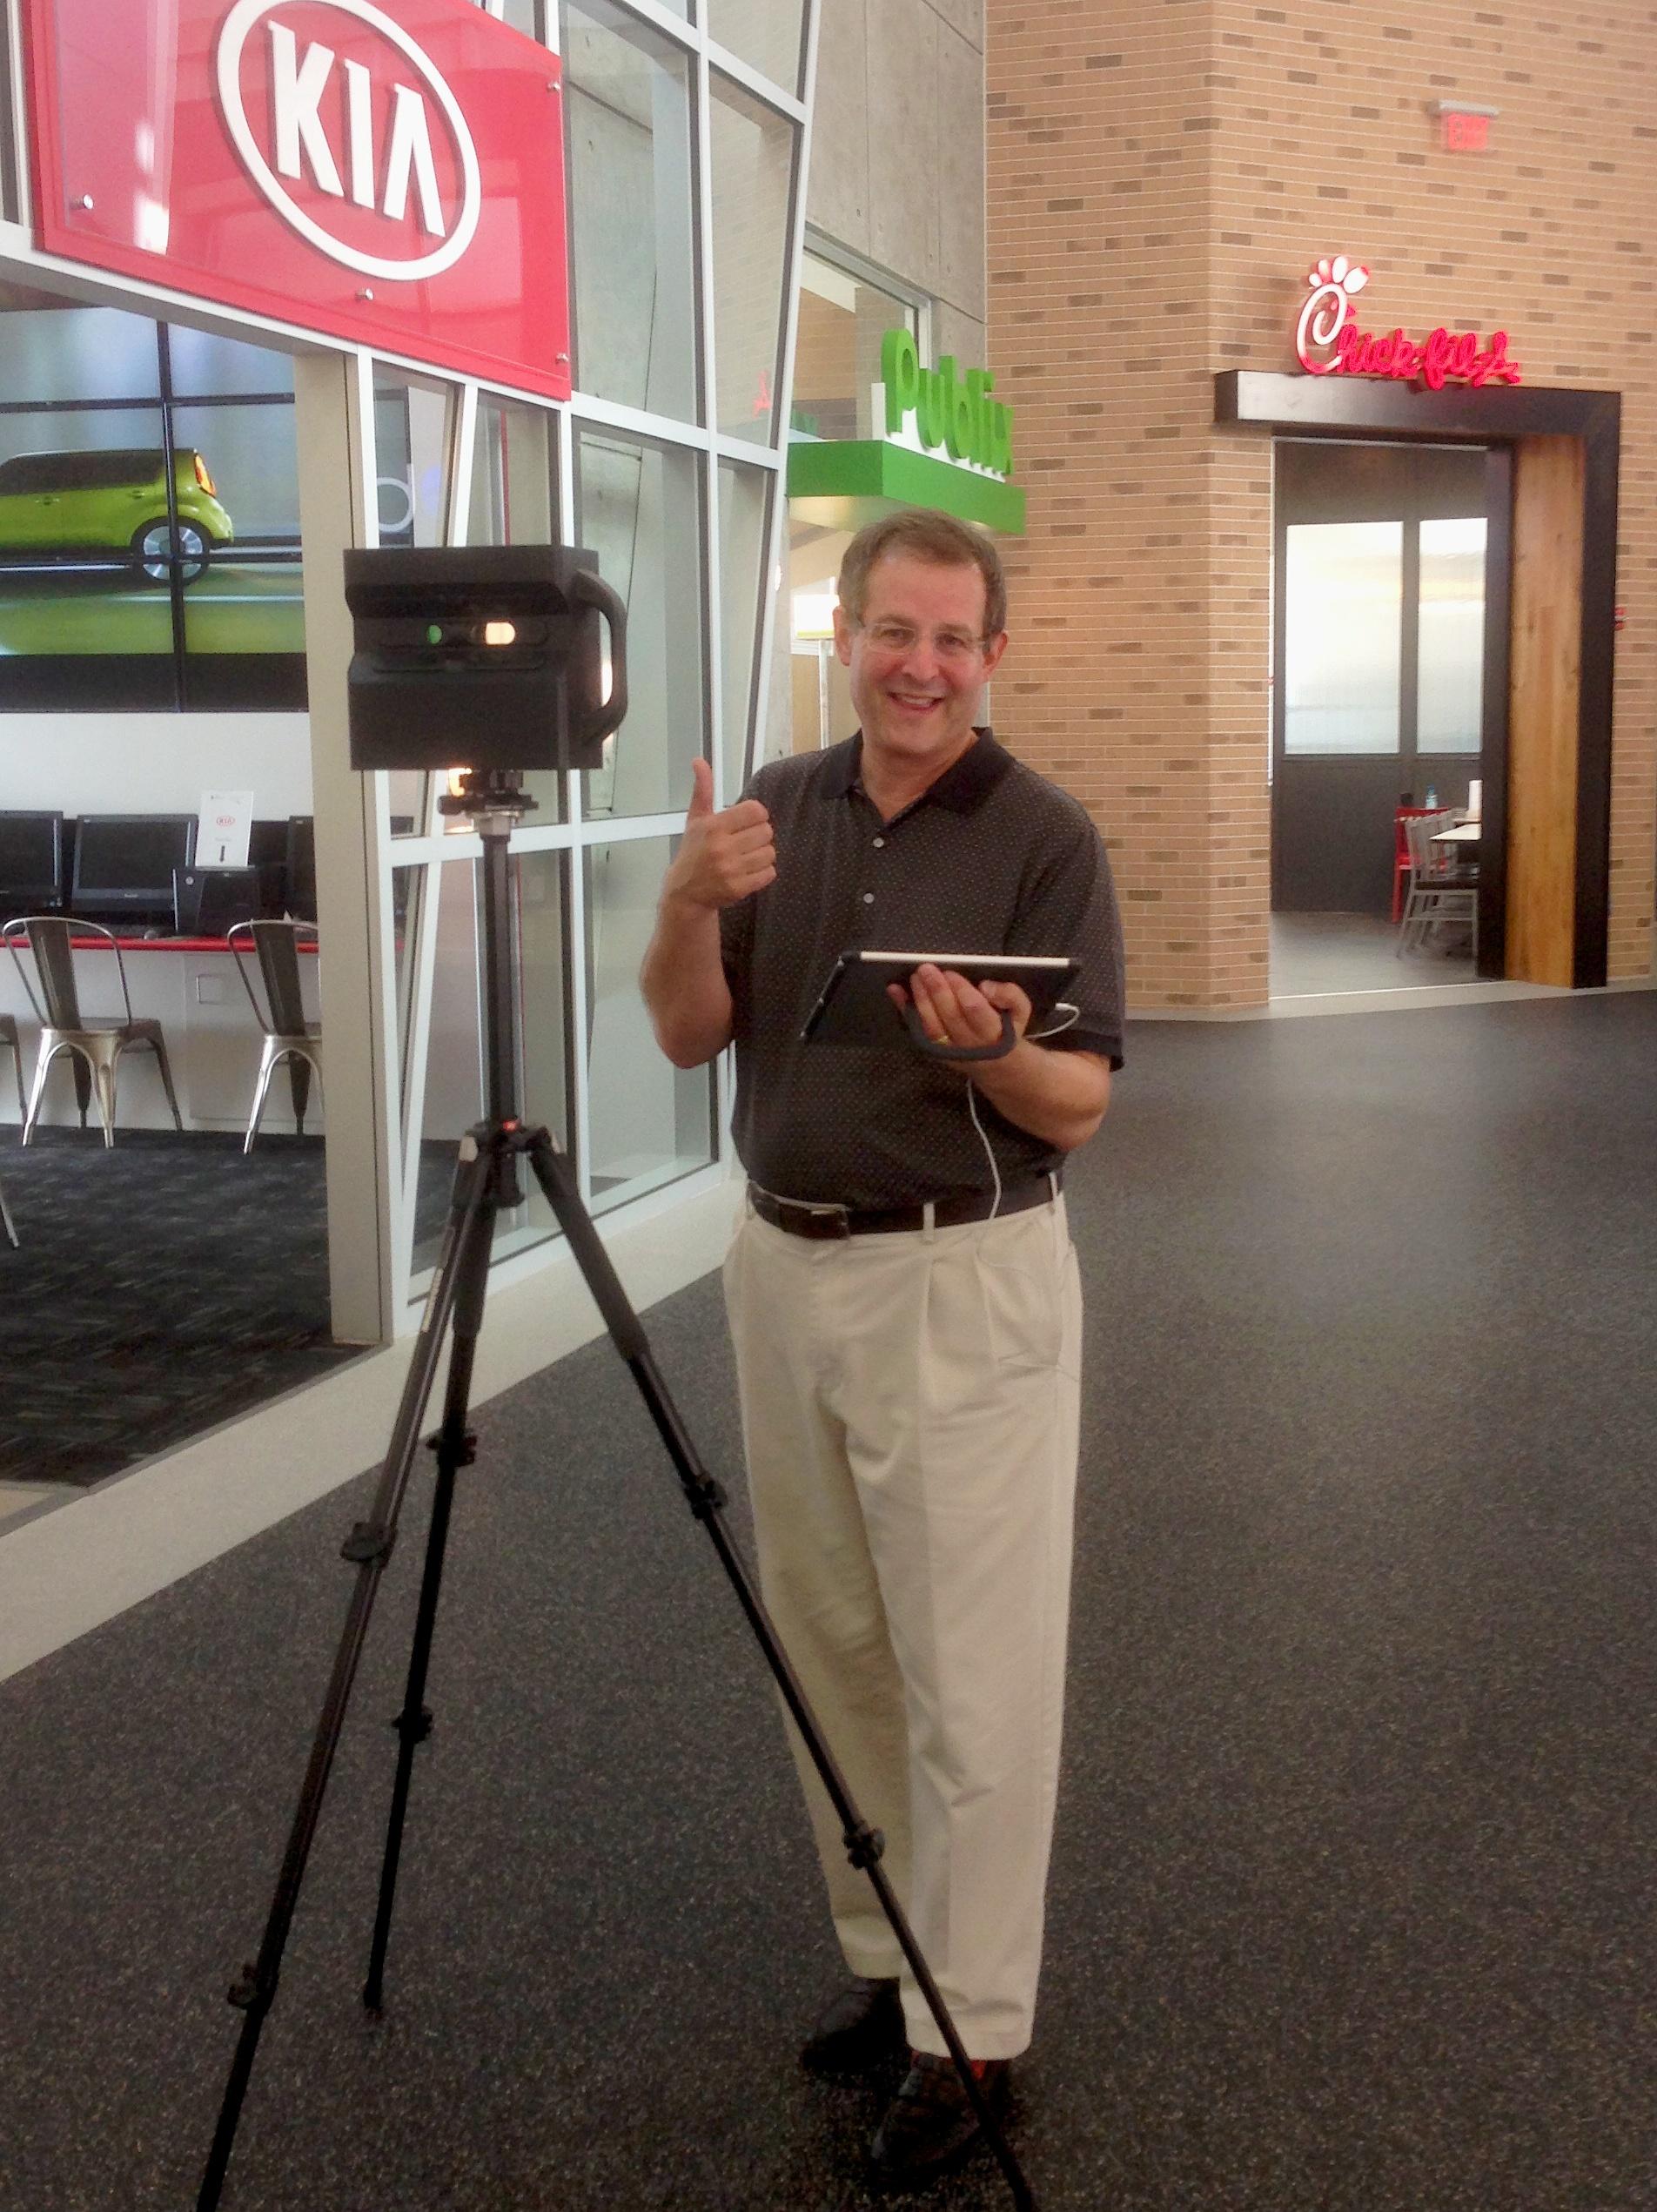 We Get Around Chief Photographer Dan Smigrod – with his Matterport Pro 3D Camera – at Junior Achievement of Georgia at the Georgia World Congress Center in Atlanta. Image courtesy of Rebecca Brooks.